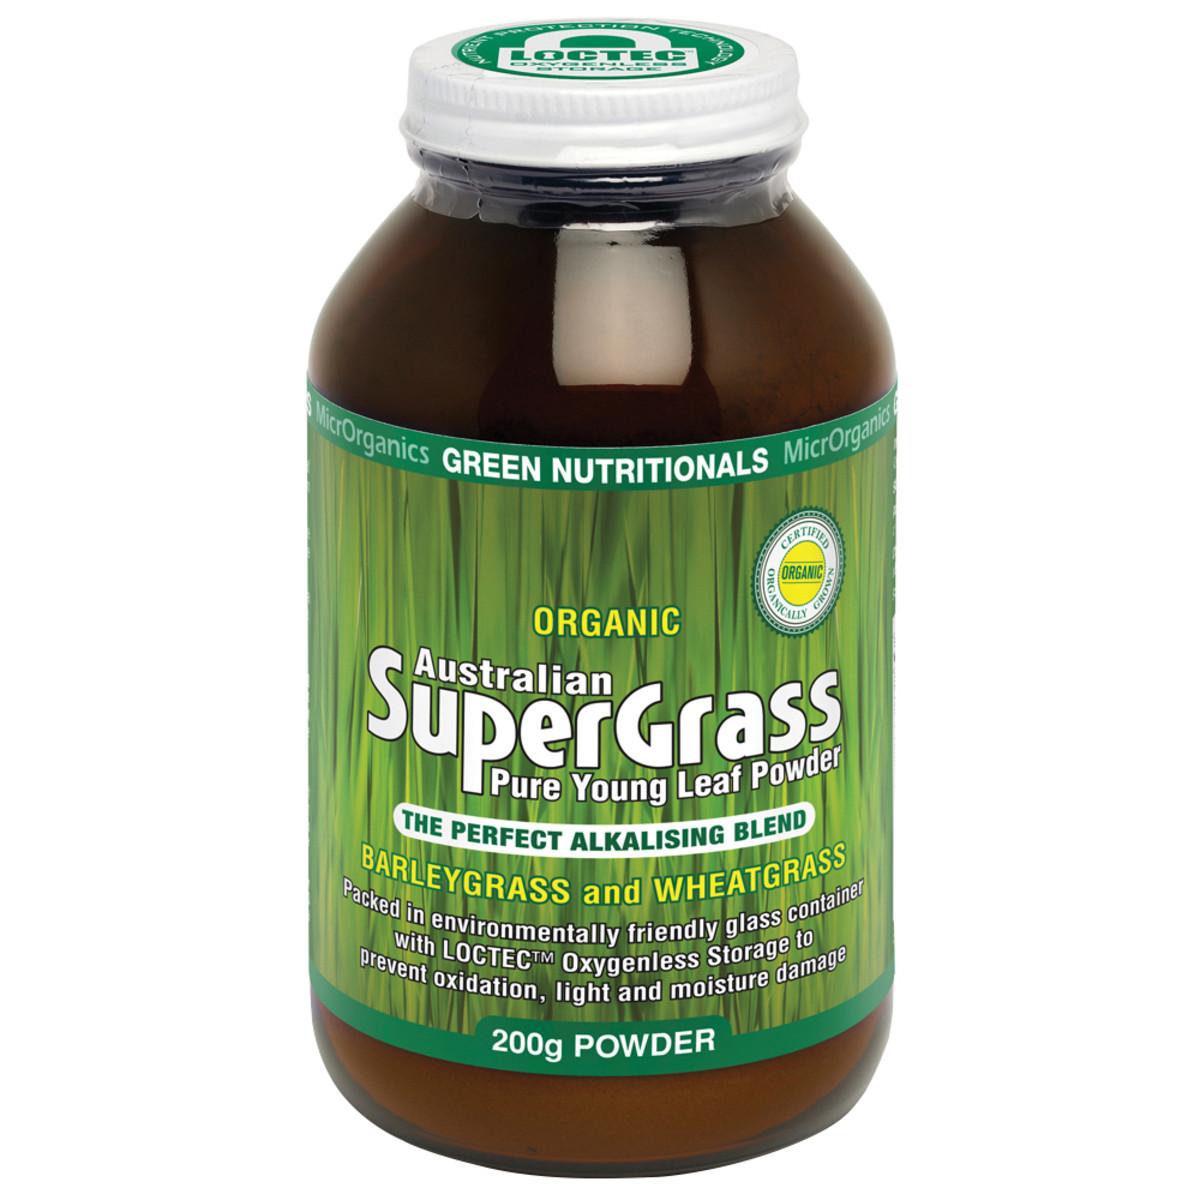 MICRORGANICS GREEN NUTRITIONALS SUPER GRASS 200G